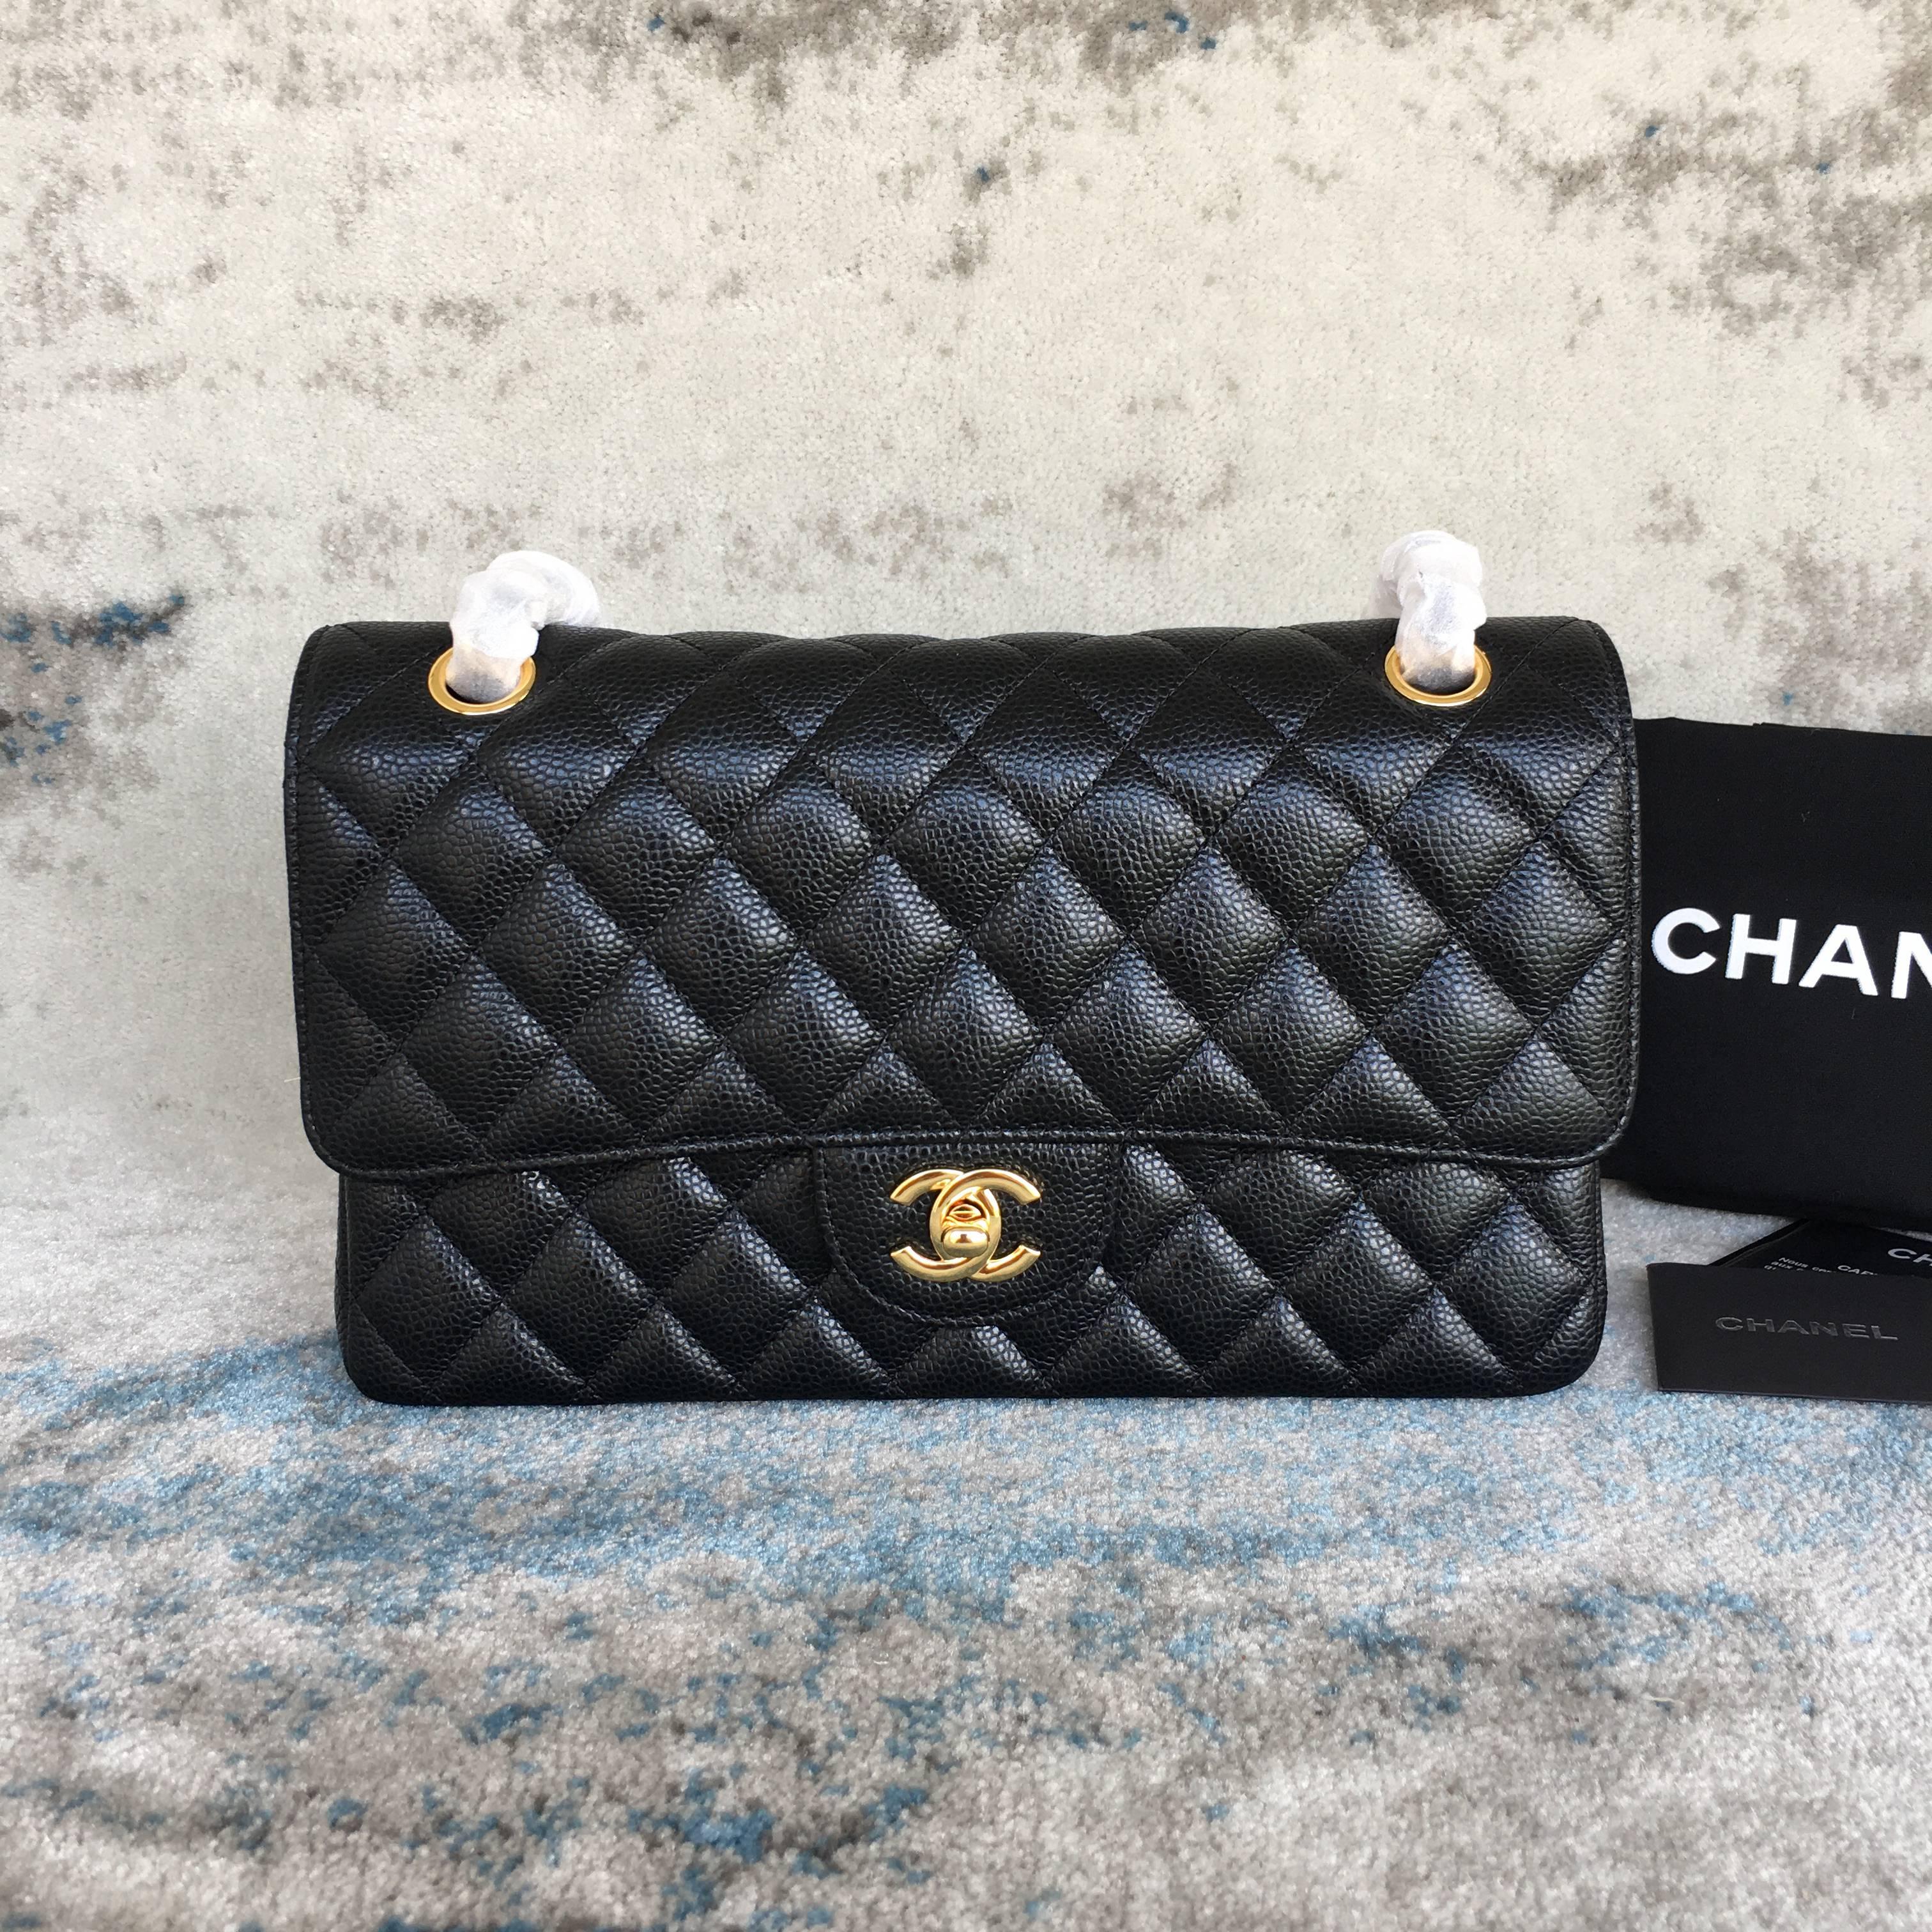 CHANEL CLASSIC HANDBAG  25cm